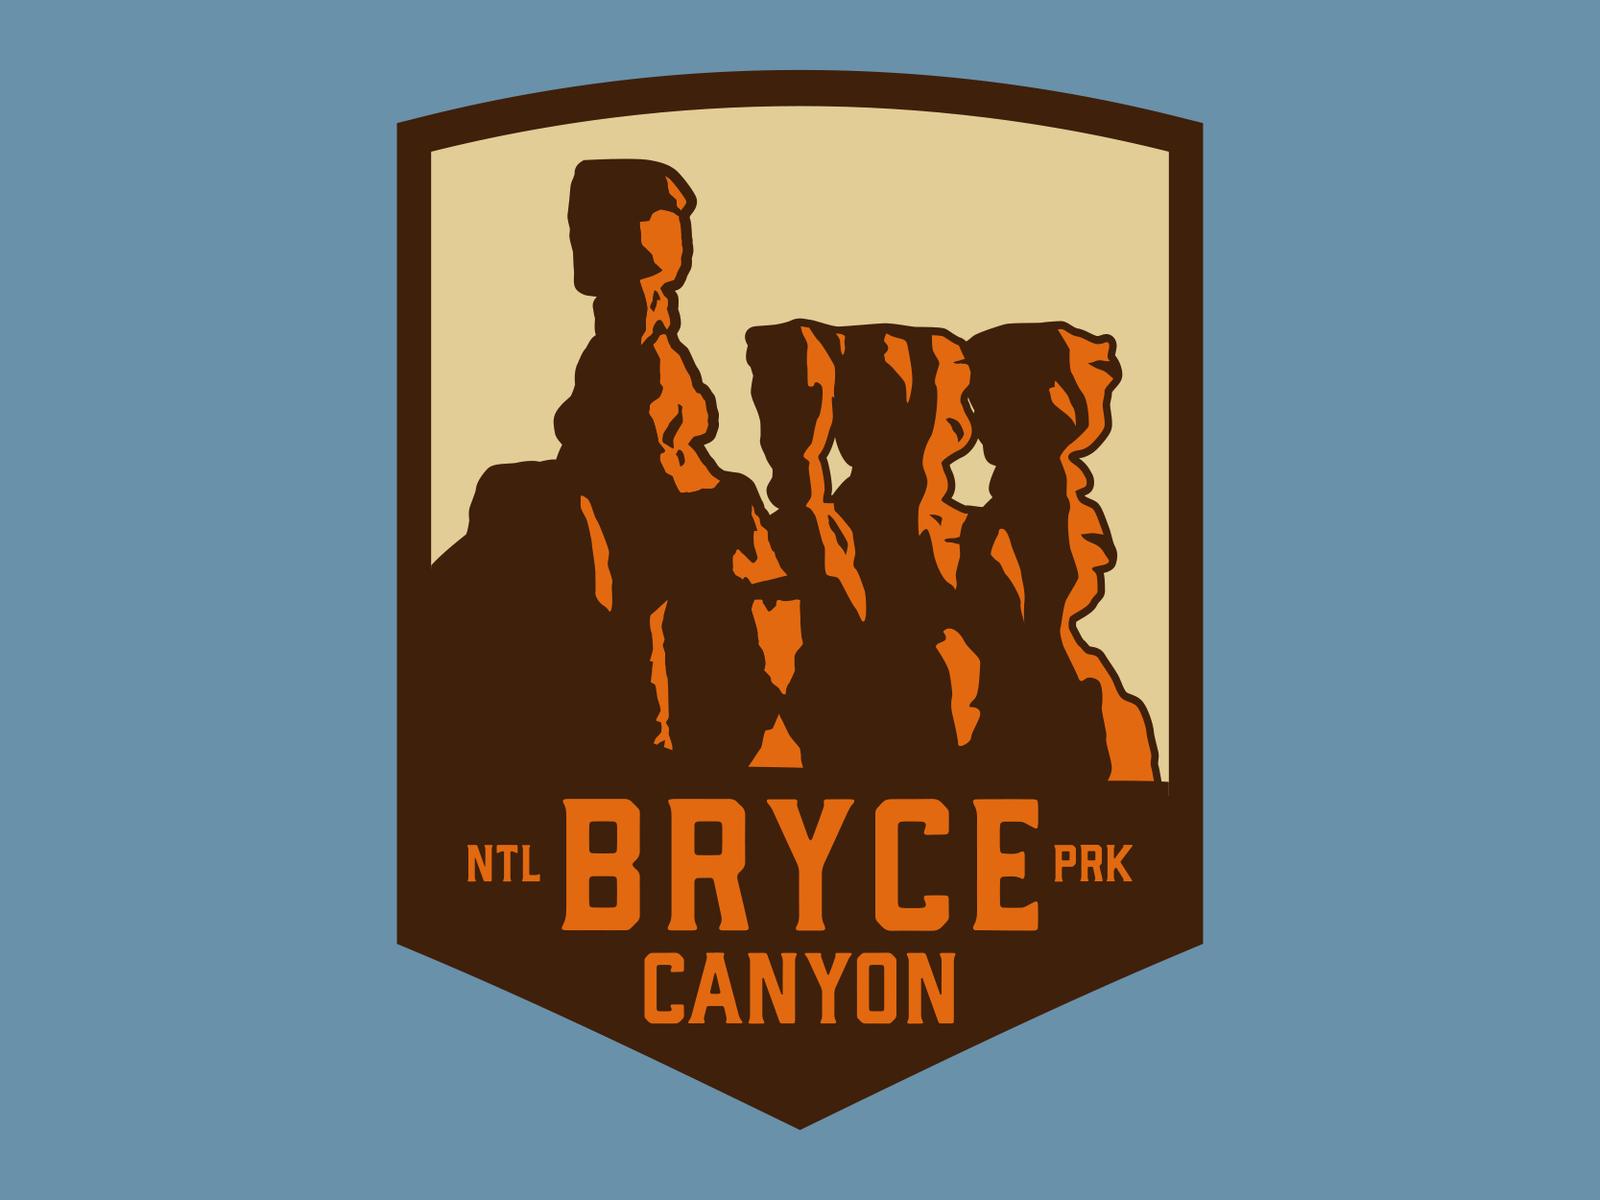 Bryce Canyon bryce canyon nps southern utah illustration design adventure sticker utah wilderness outdoors national park logo vintage retro patch badge